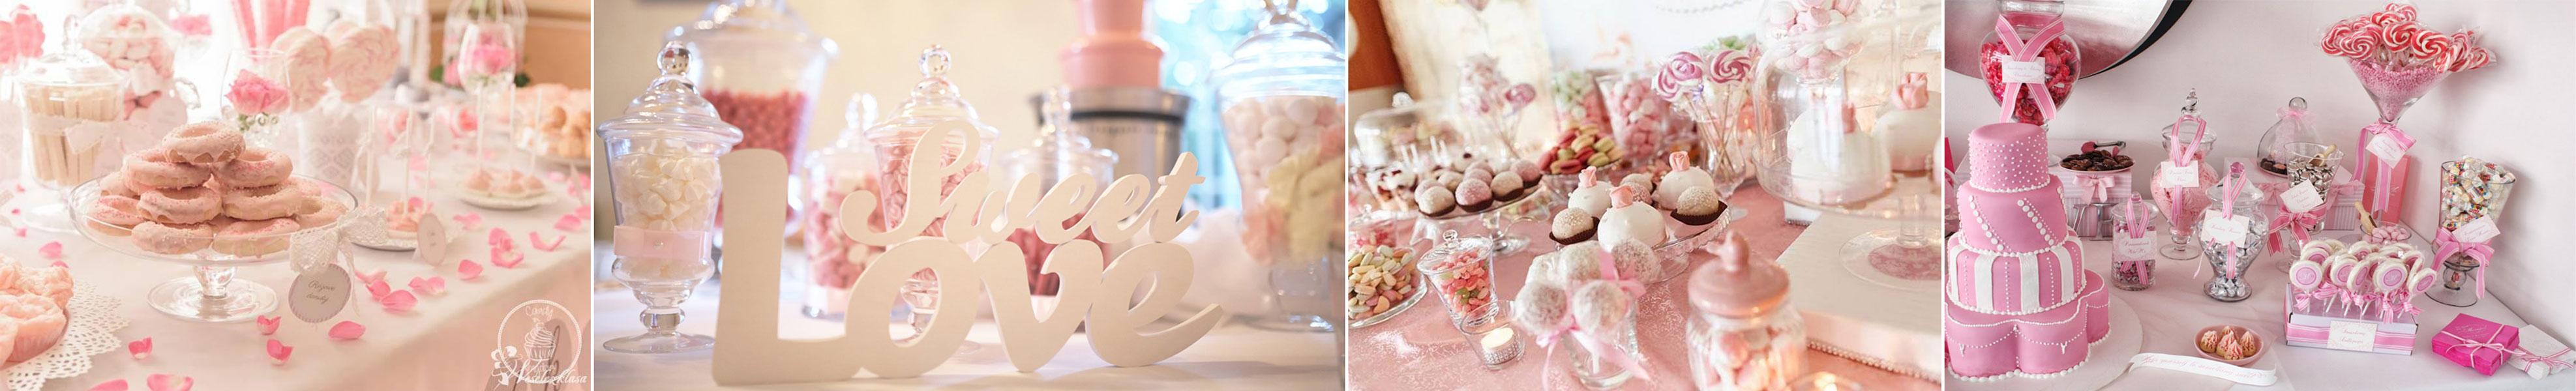 candy-bar-różowy